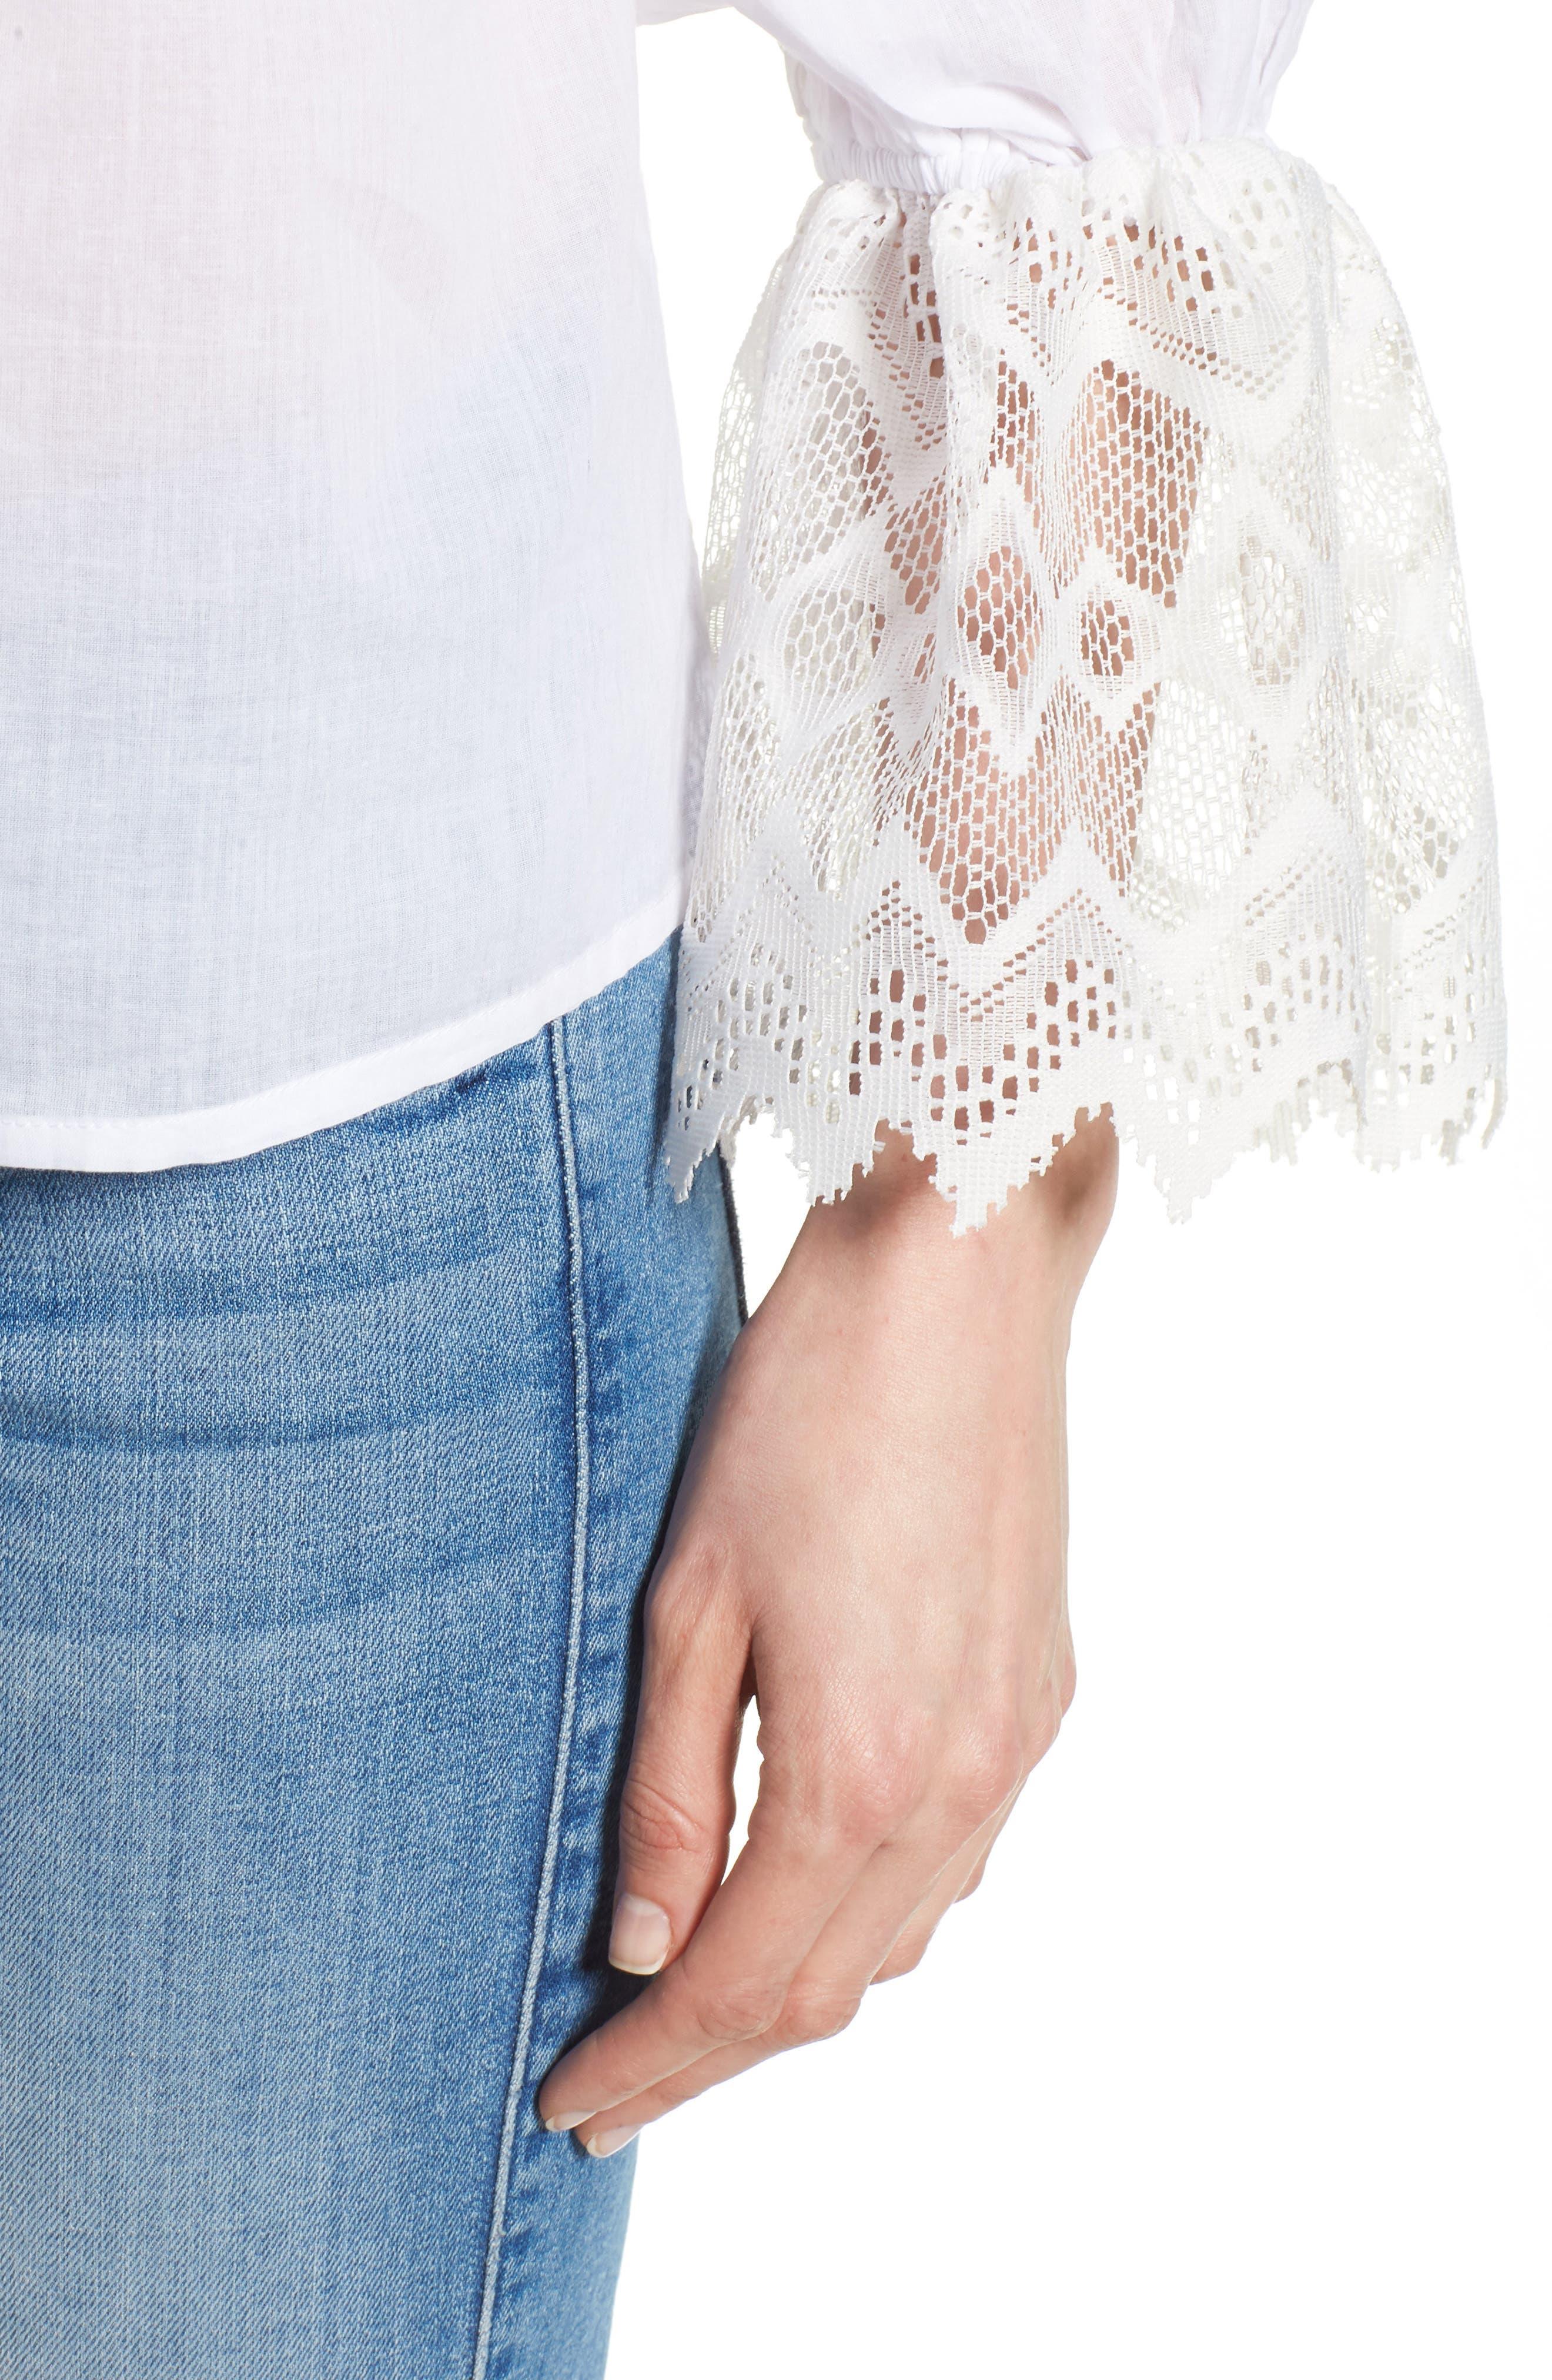 Berkley White Lace Cotton Blend Top,                             Alternate thumbnail 4, color,                             WHITE